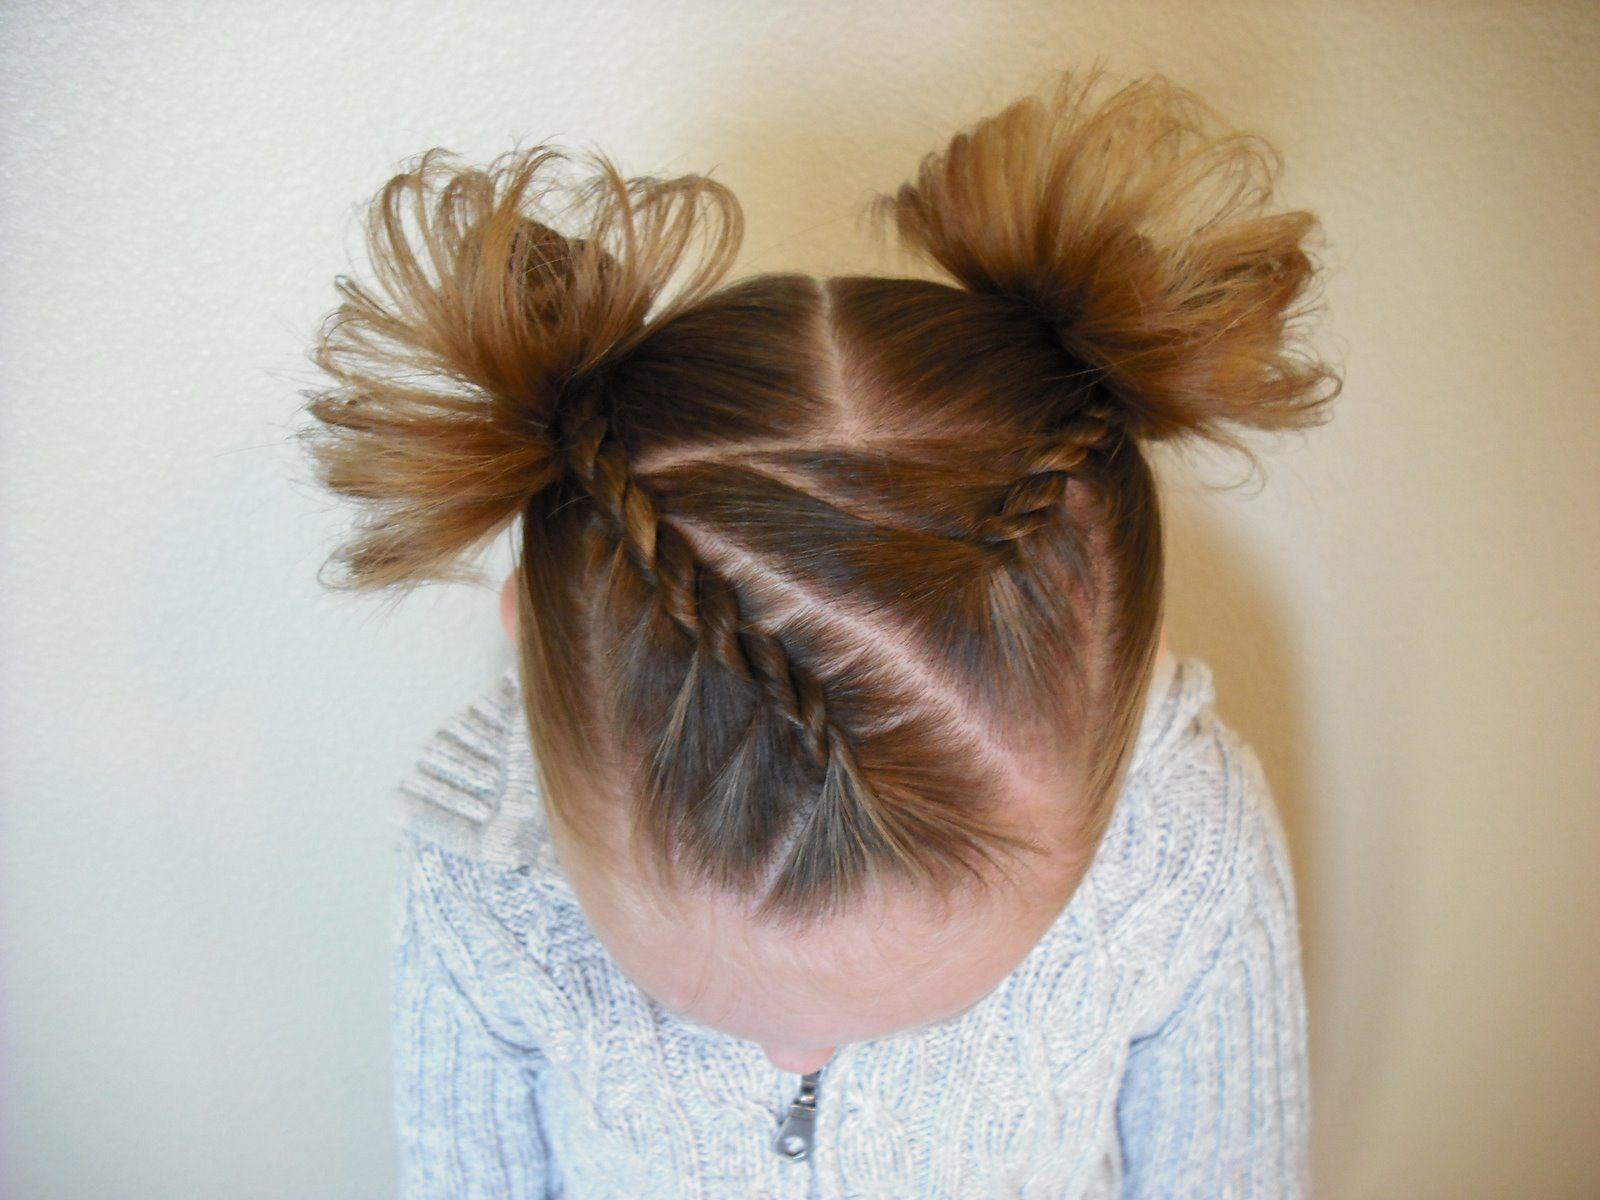 Twists aaliyahus hairstyles pinterest girl hair hair style